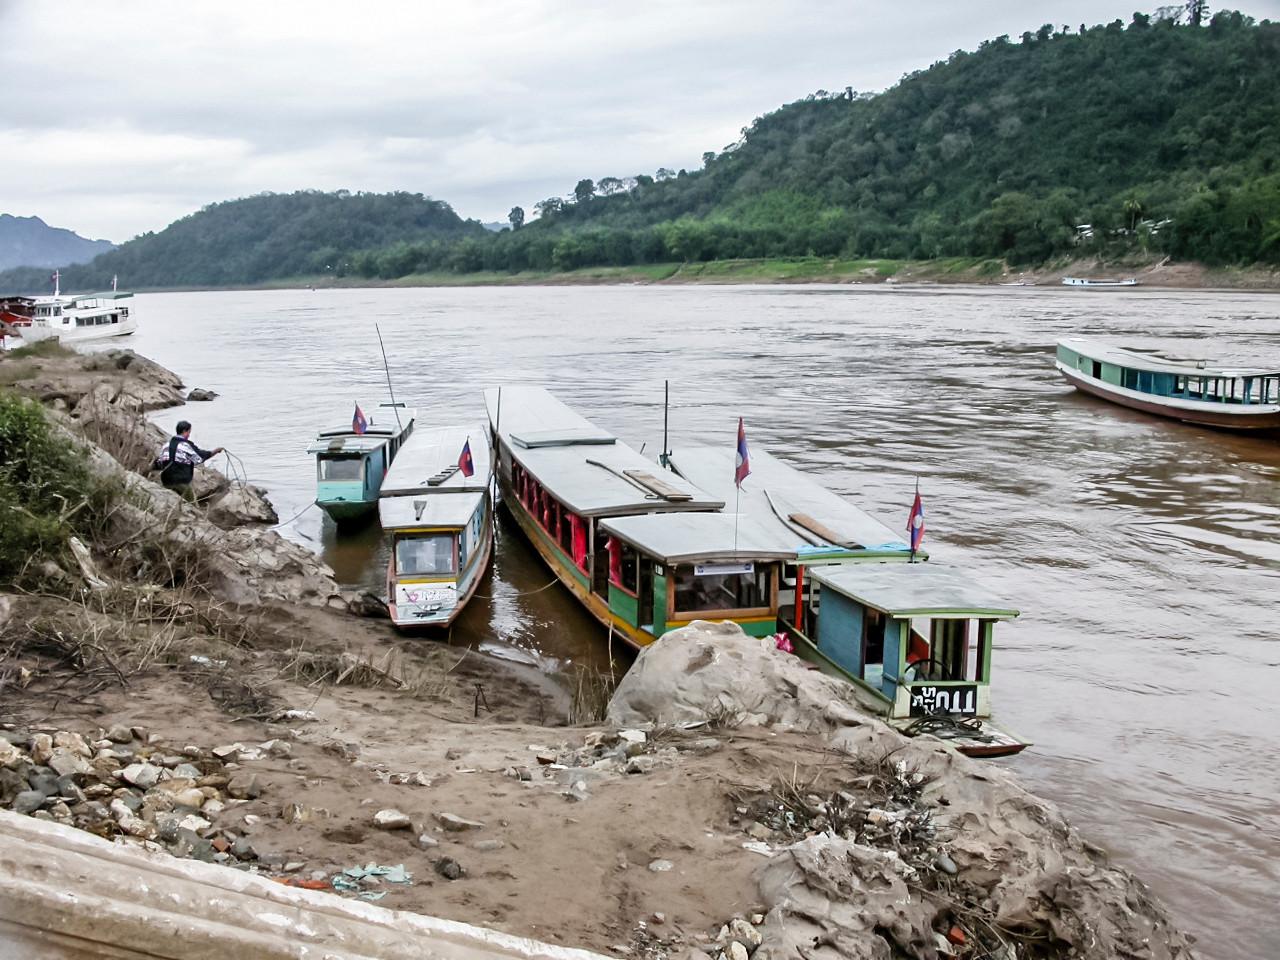 Mekong River, Luang Prabang, Laos